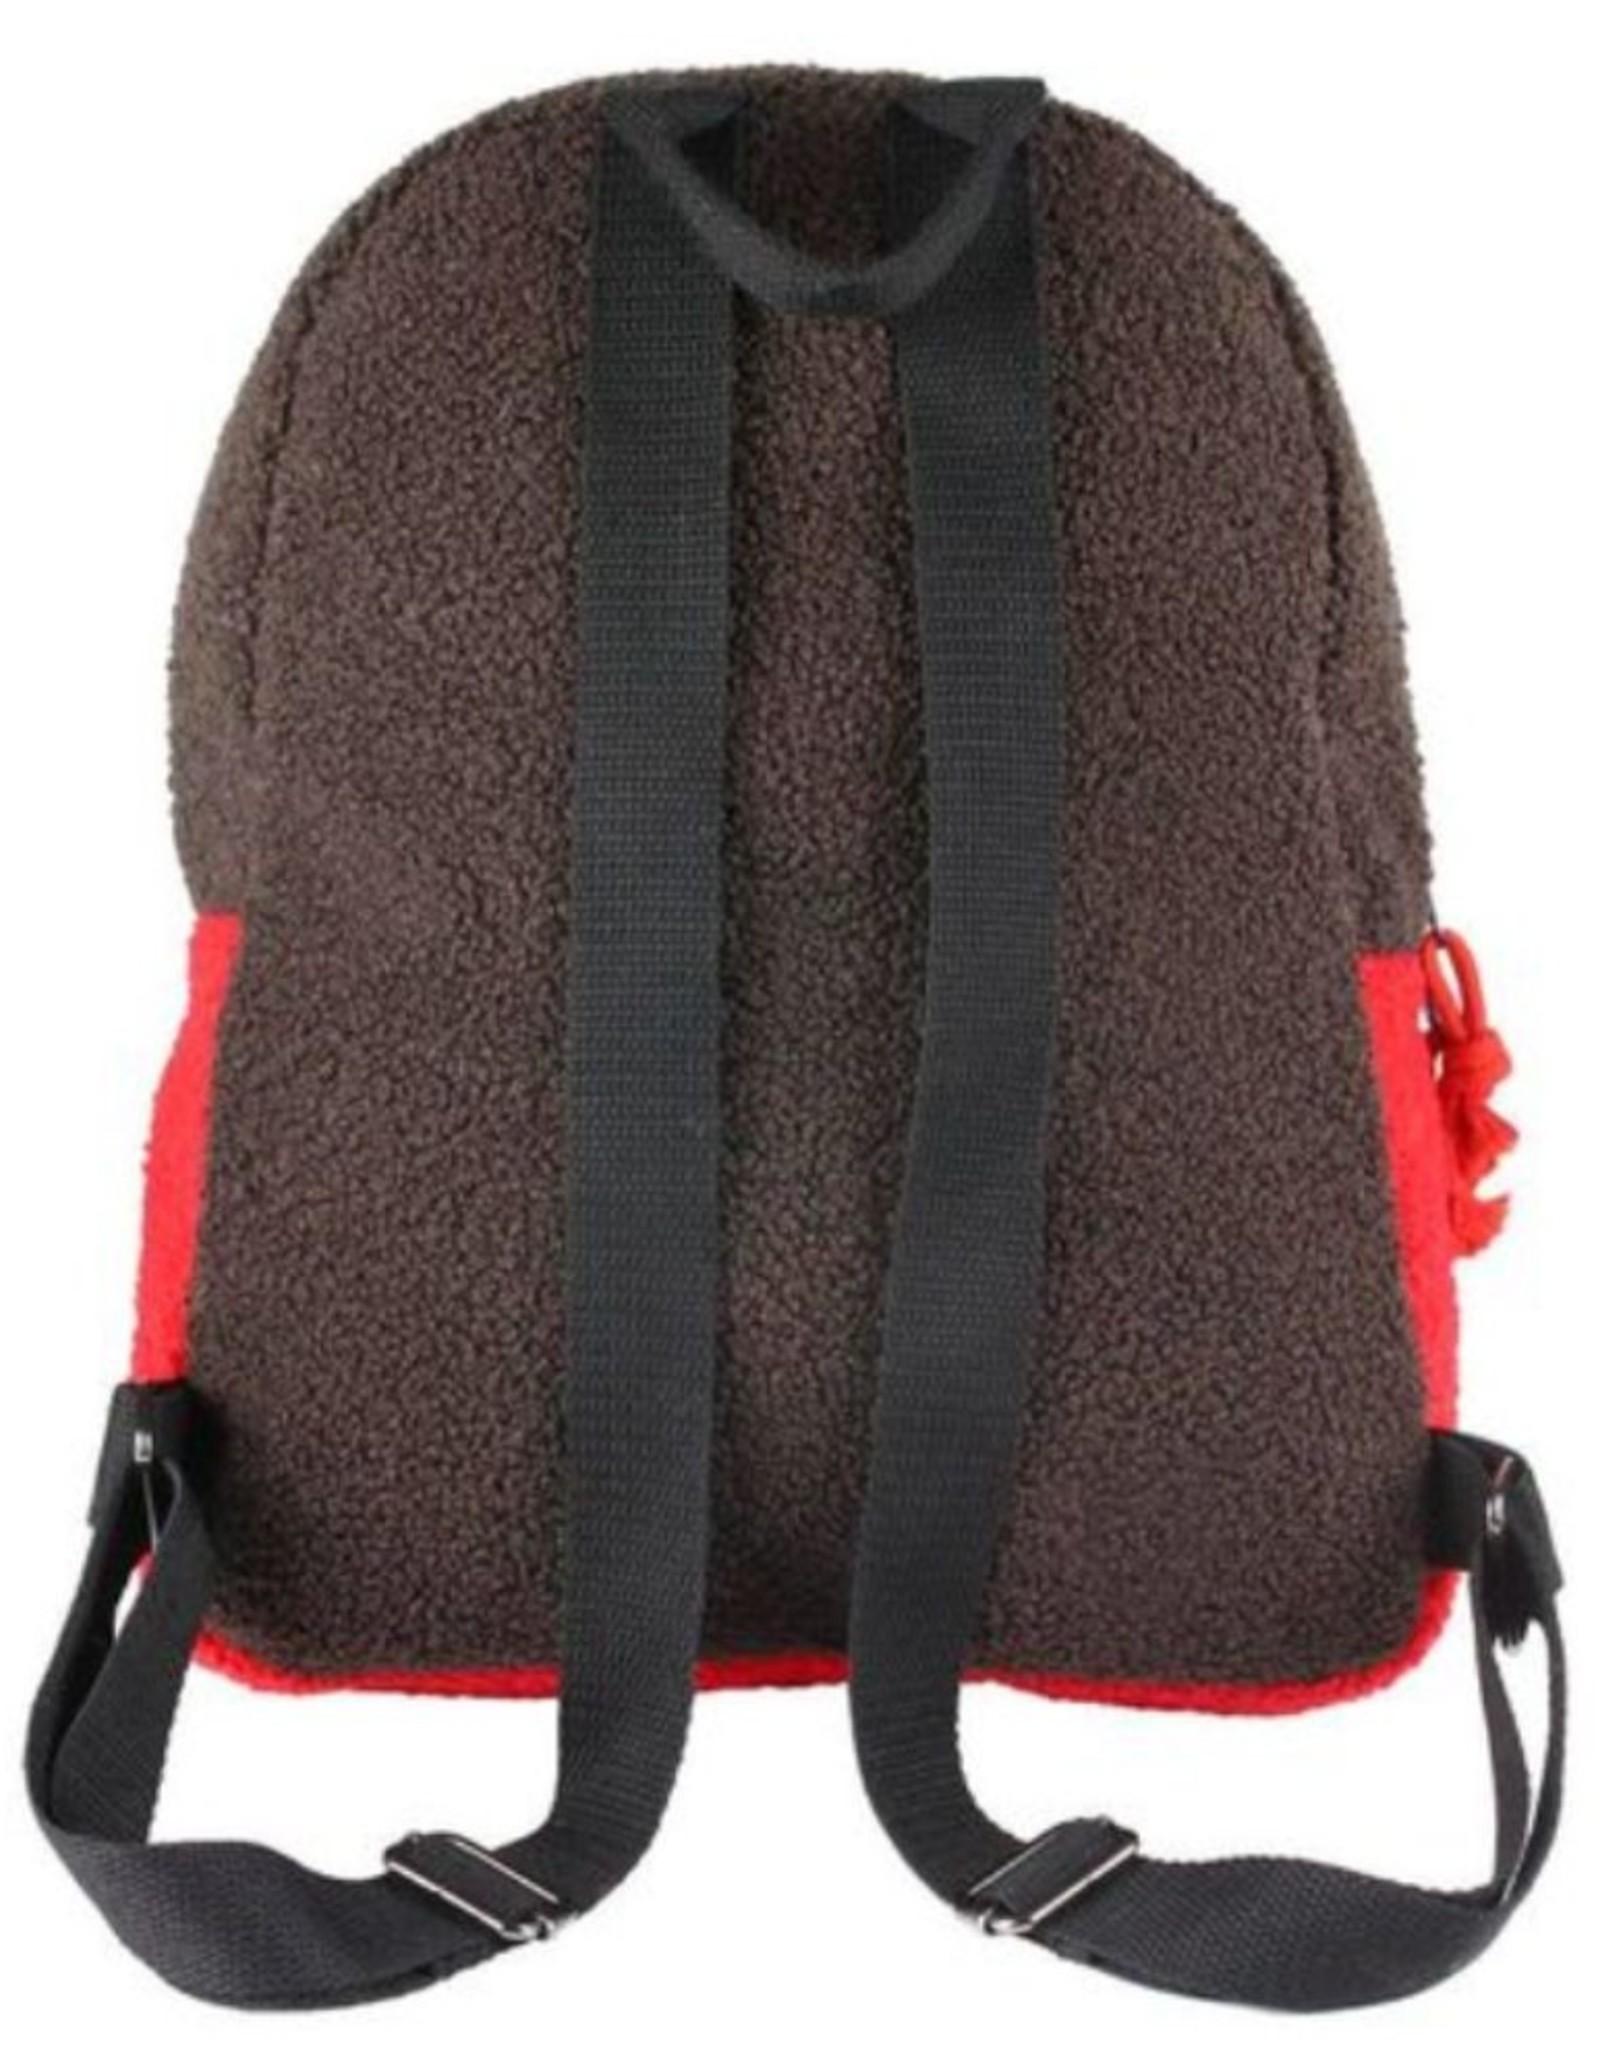 Disney Disney bags - Disney plush backpack Grumpy 34cm